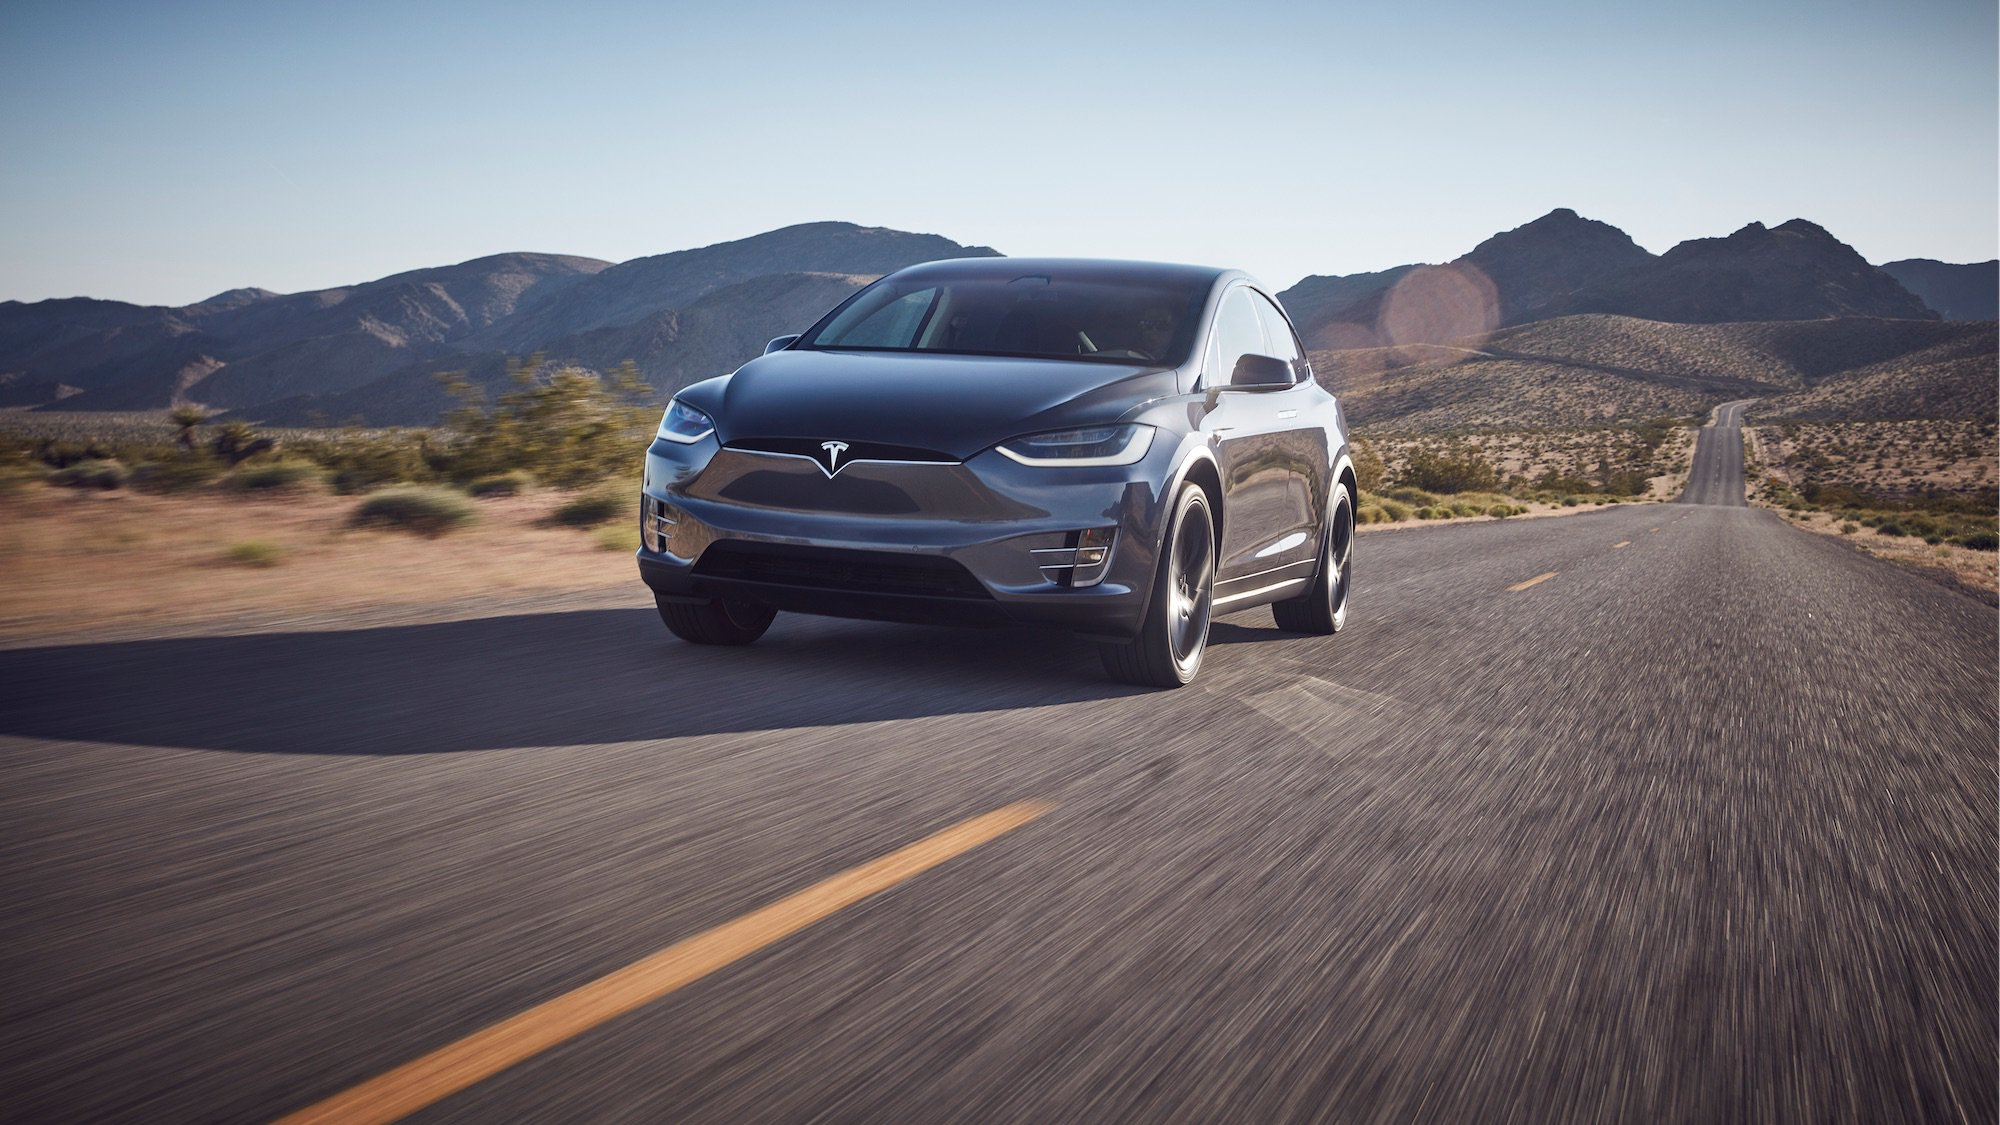 New Tesla voluntary recall applies to 11,000 Model X vehicles https://t.co/VTa7X3LKB3 by @etherington https://t.co/pCgT0XSkeo